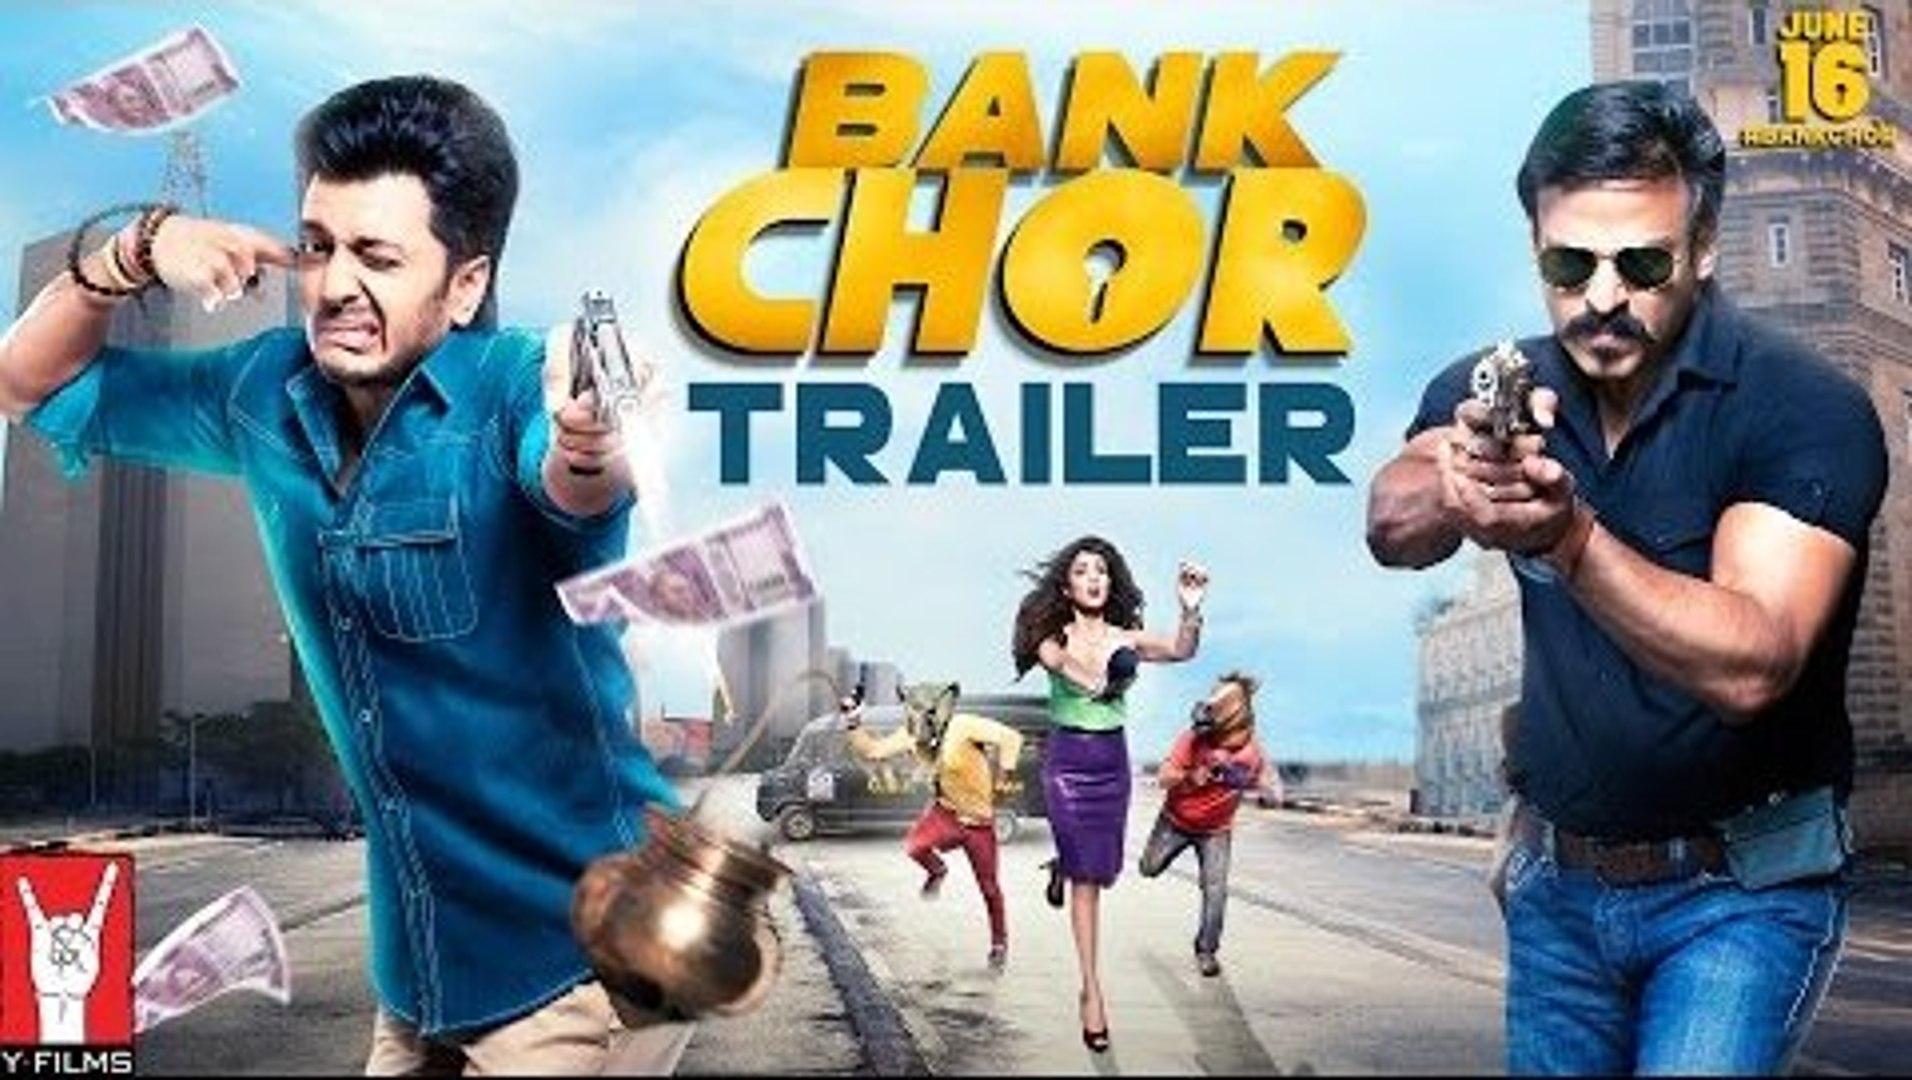 Bank Chor Official Movie Trailer HD 2017 - Riteish Deshmukh - Vivek Anand Oberoi - Rhea Chakraborty